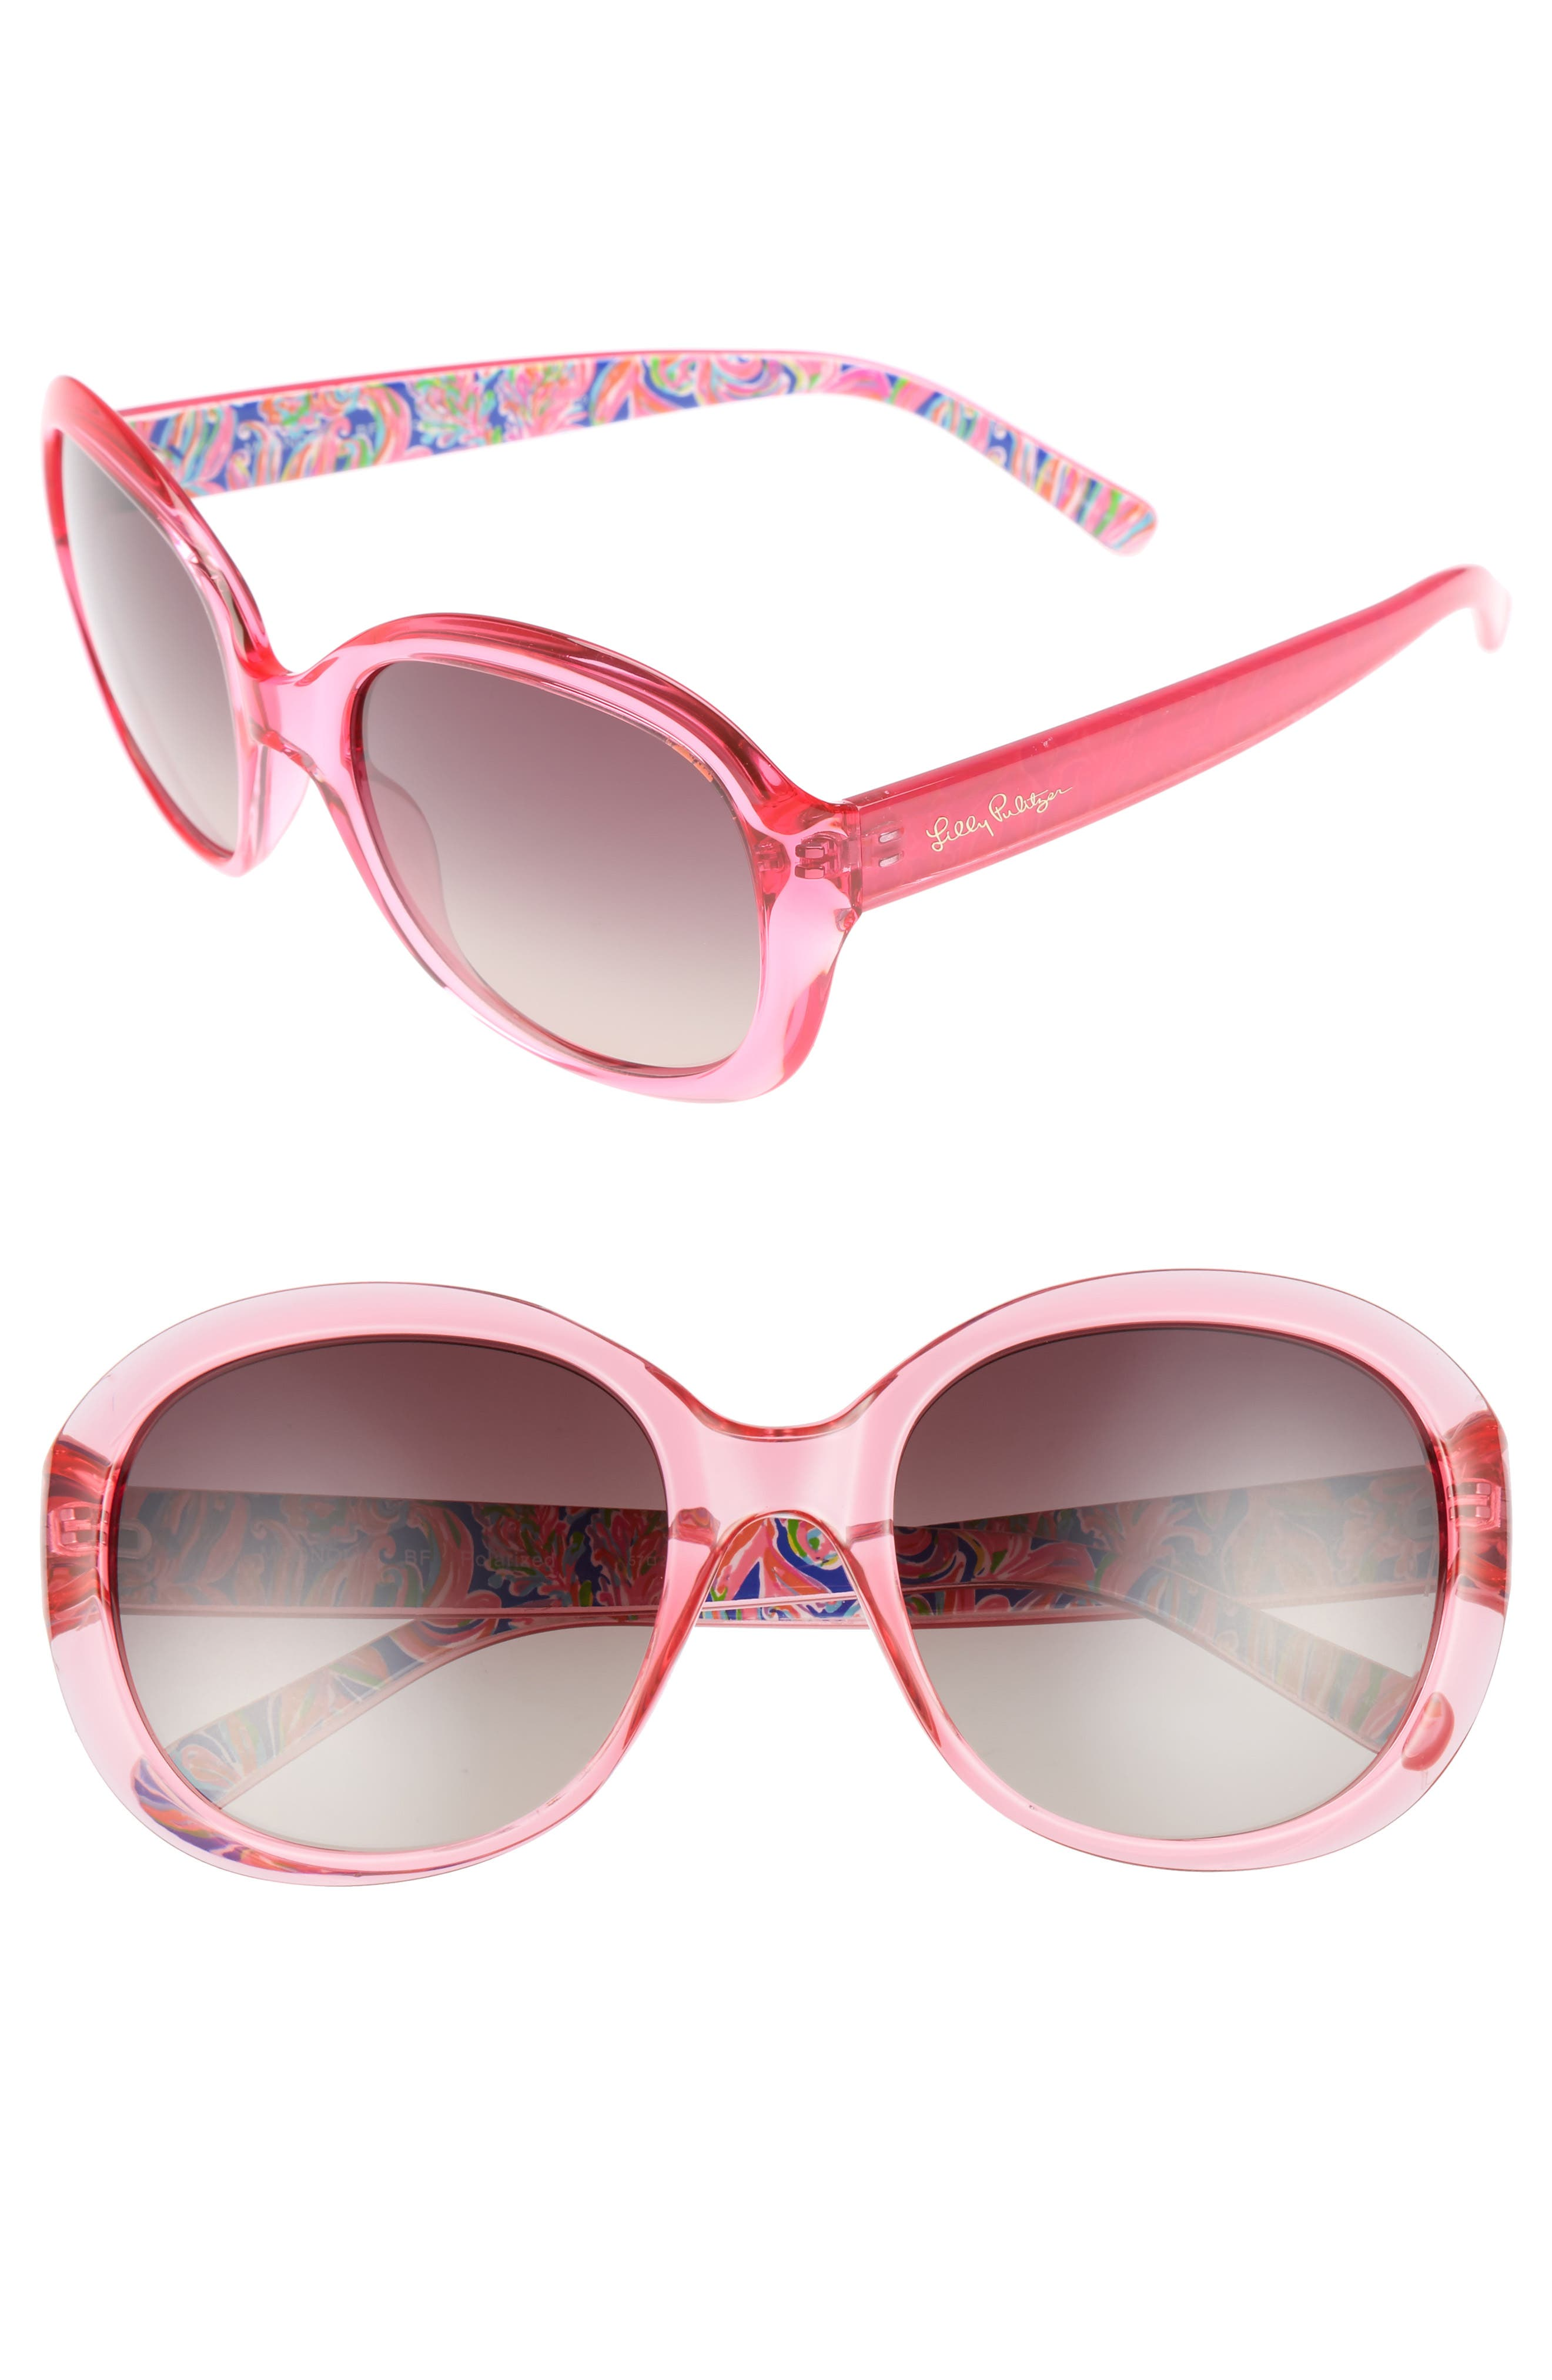 Lilly Pulitzer® Magnolia 57mm Polarized Round Sunglasses